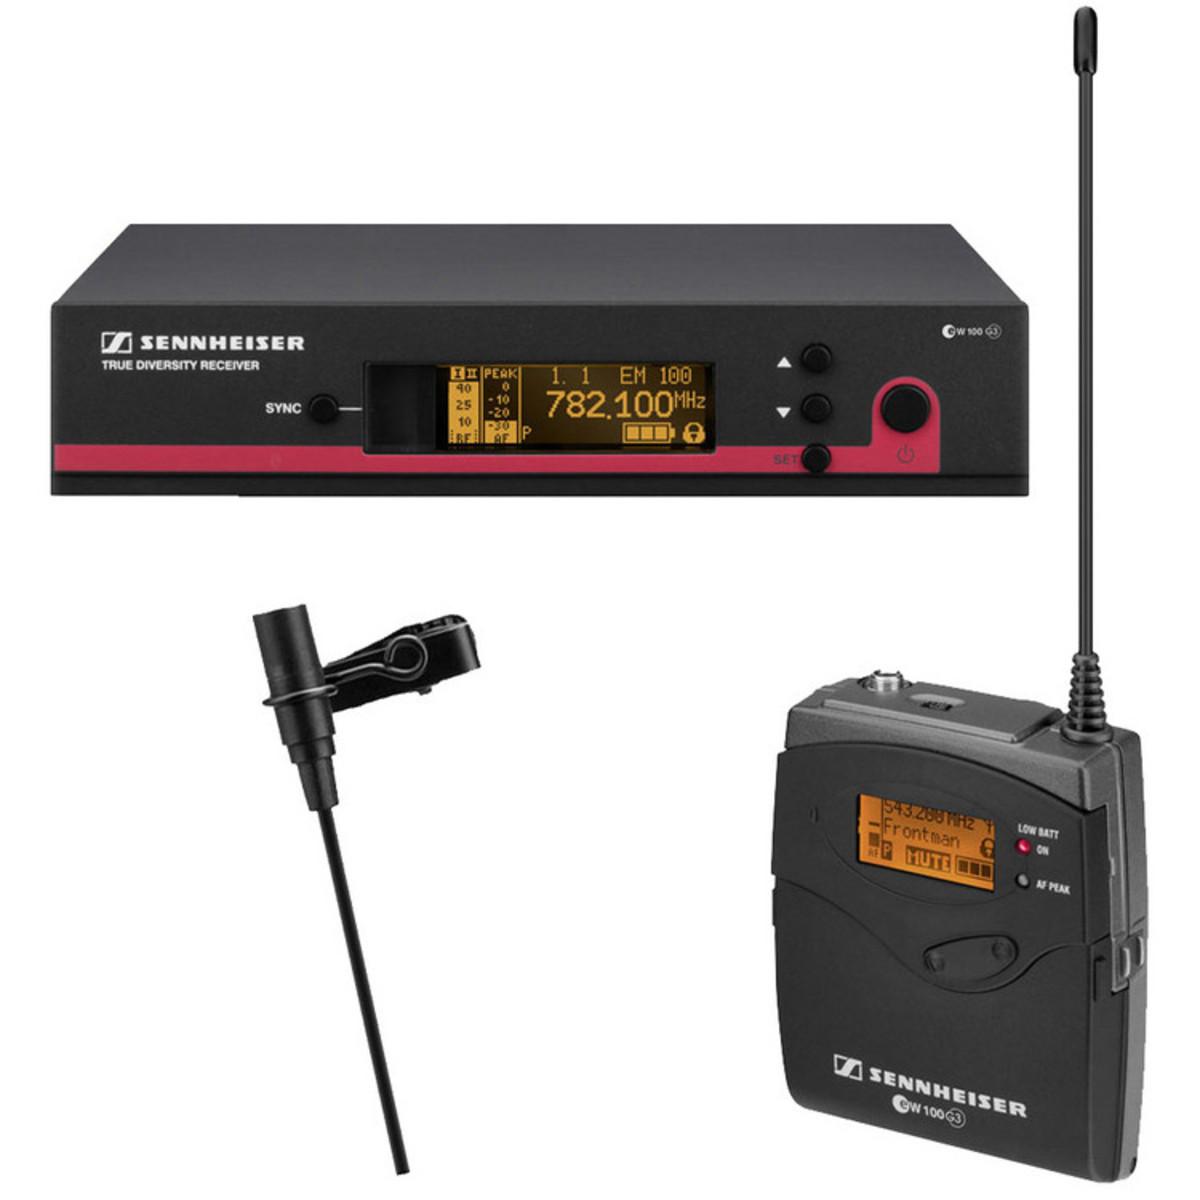 sennheiser ew 112 g3 gb wireless lavalier microphone system b stock at gear4music. Black Bedroom Furniture Sets. Home Design Ideas